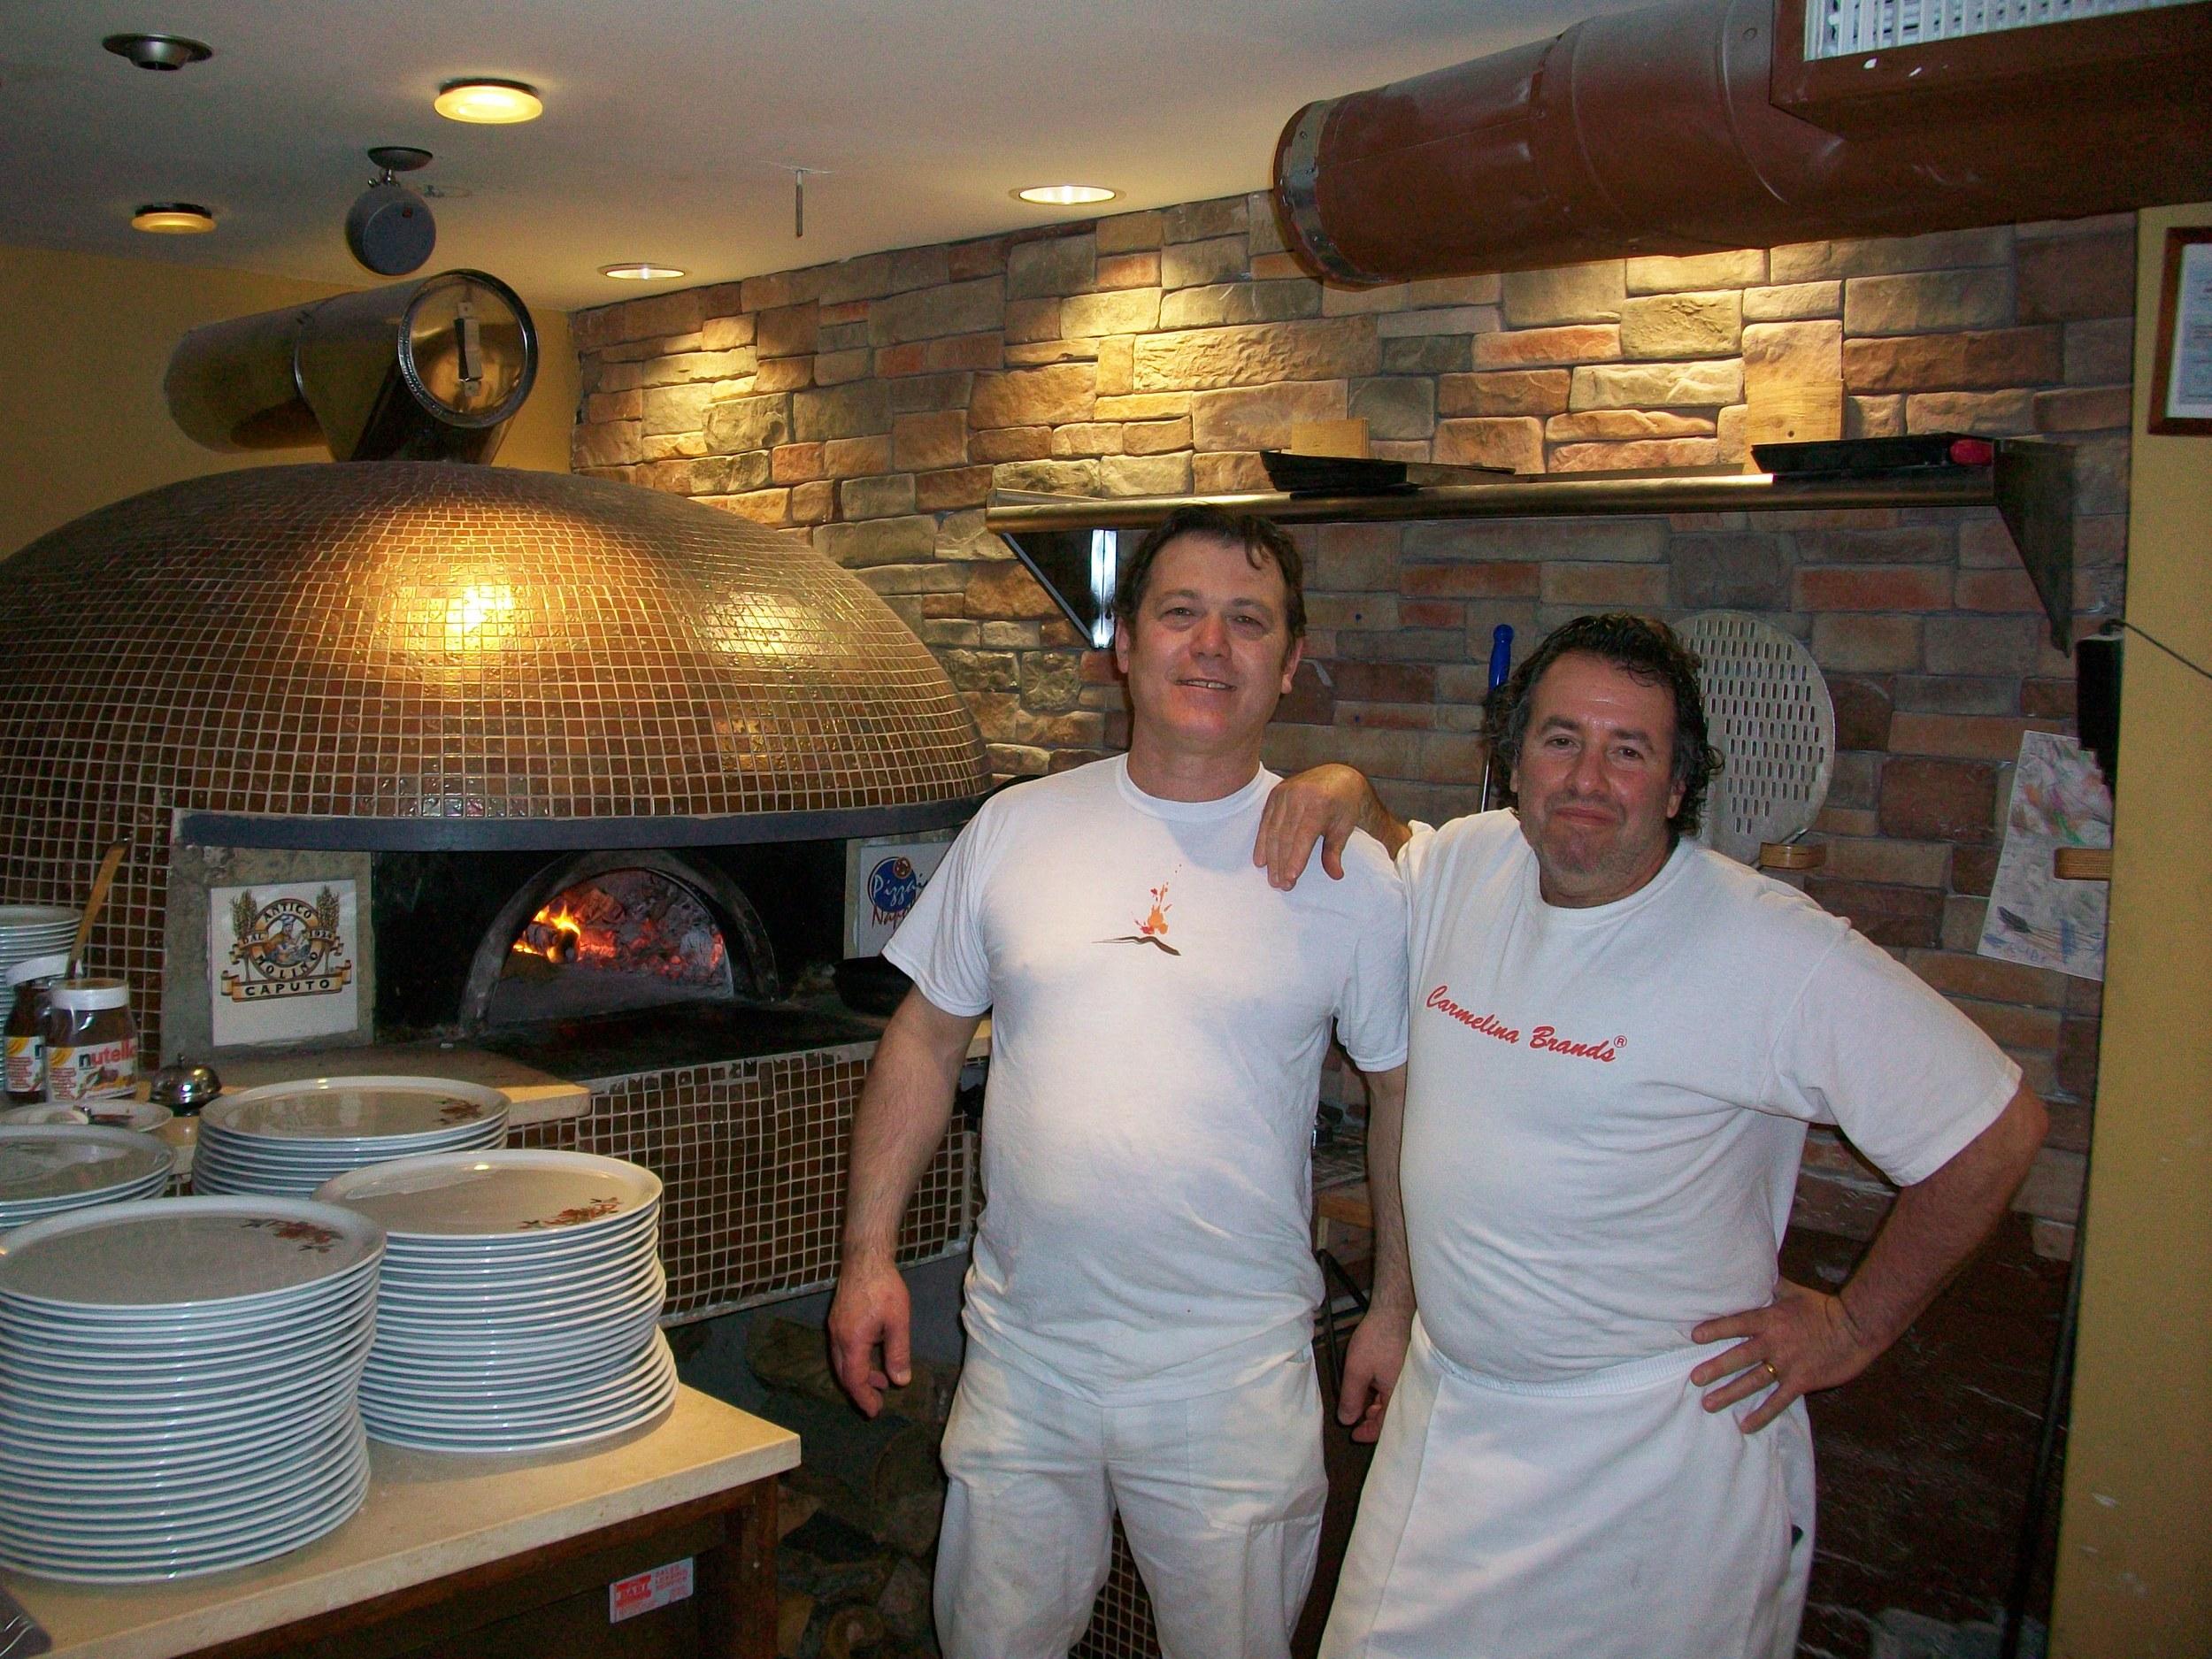 Roberto-Caporuscio-Jonathan-Goldsmith-Keste-Pizzeria-New-York